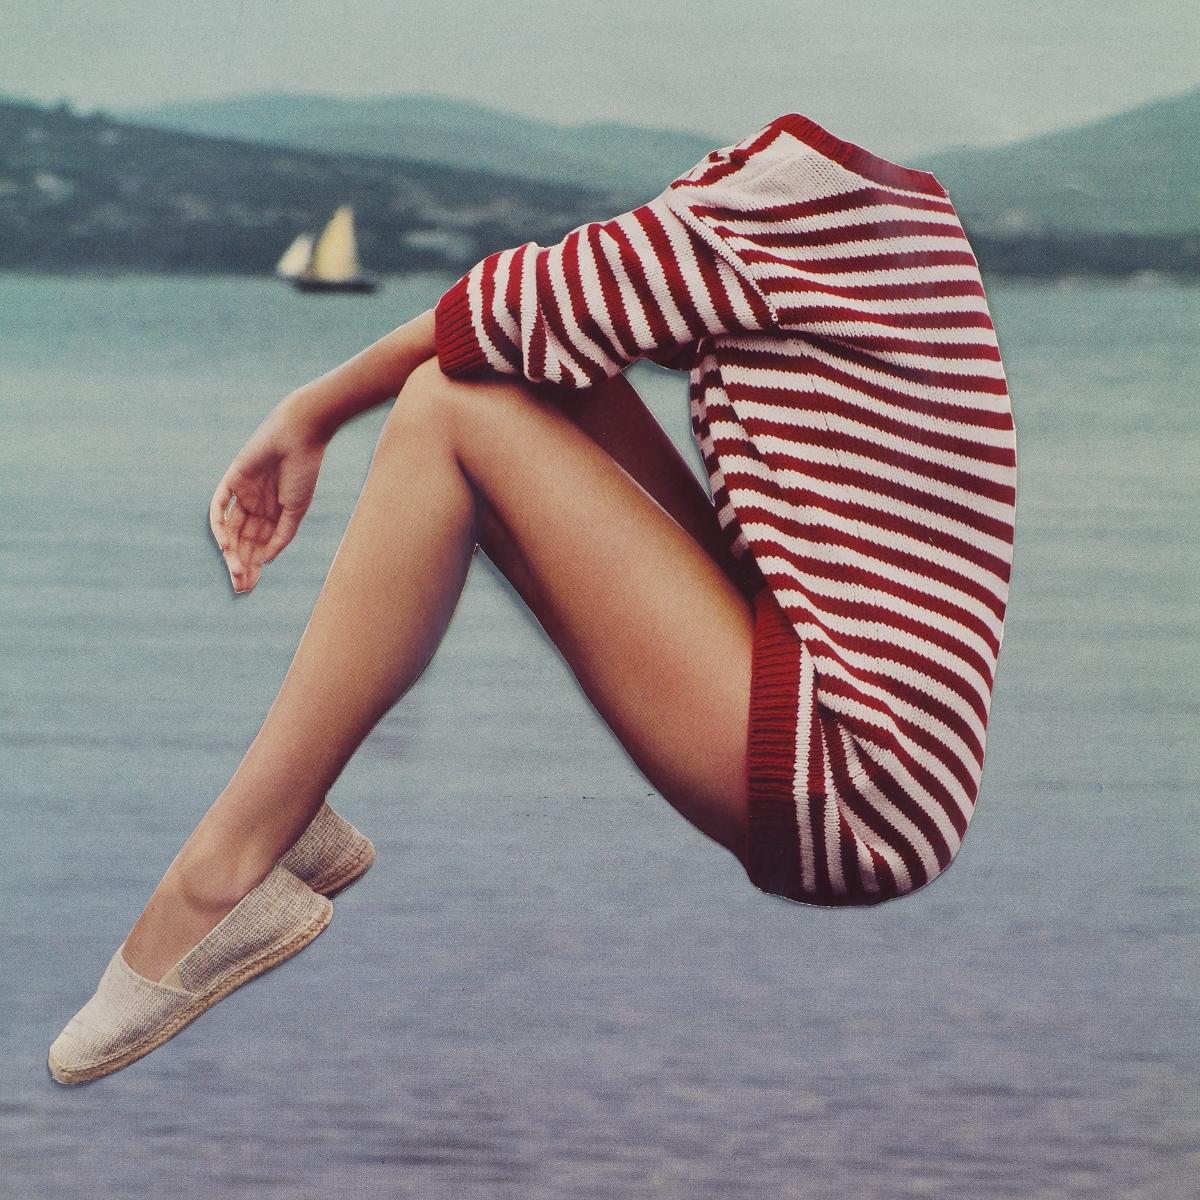 Warm Sweater Harbor. Collage pa - keysgoclick   ello